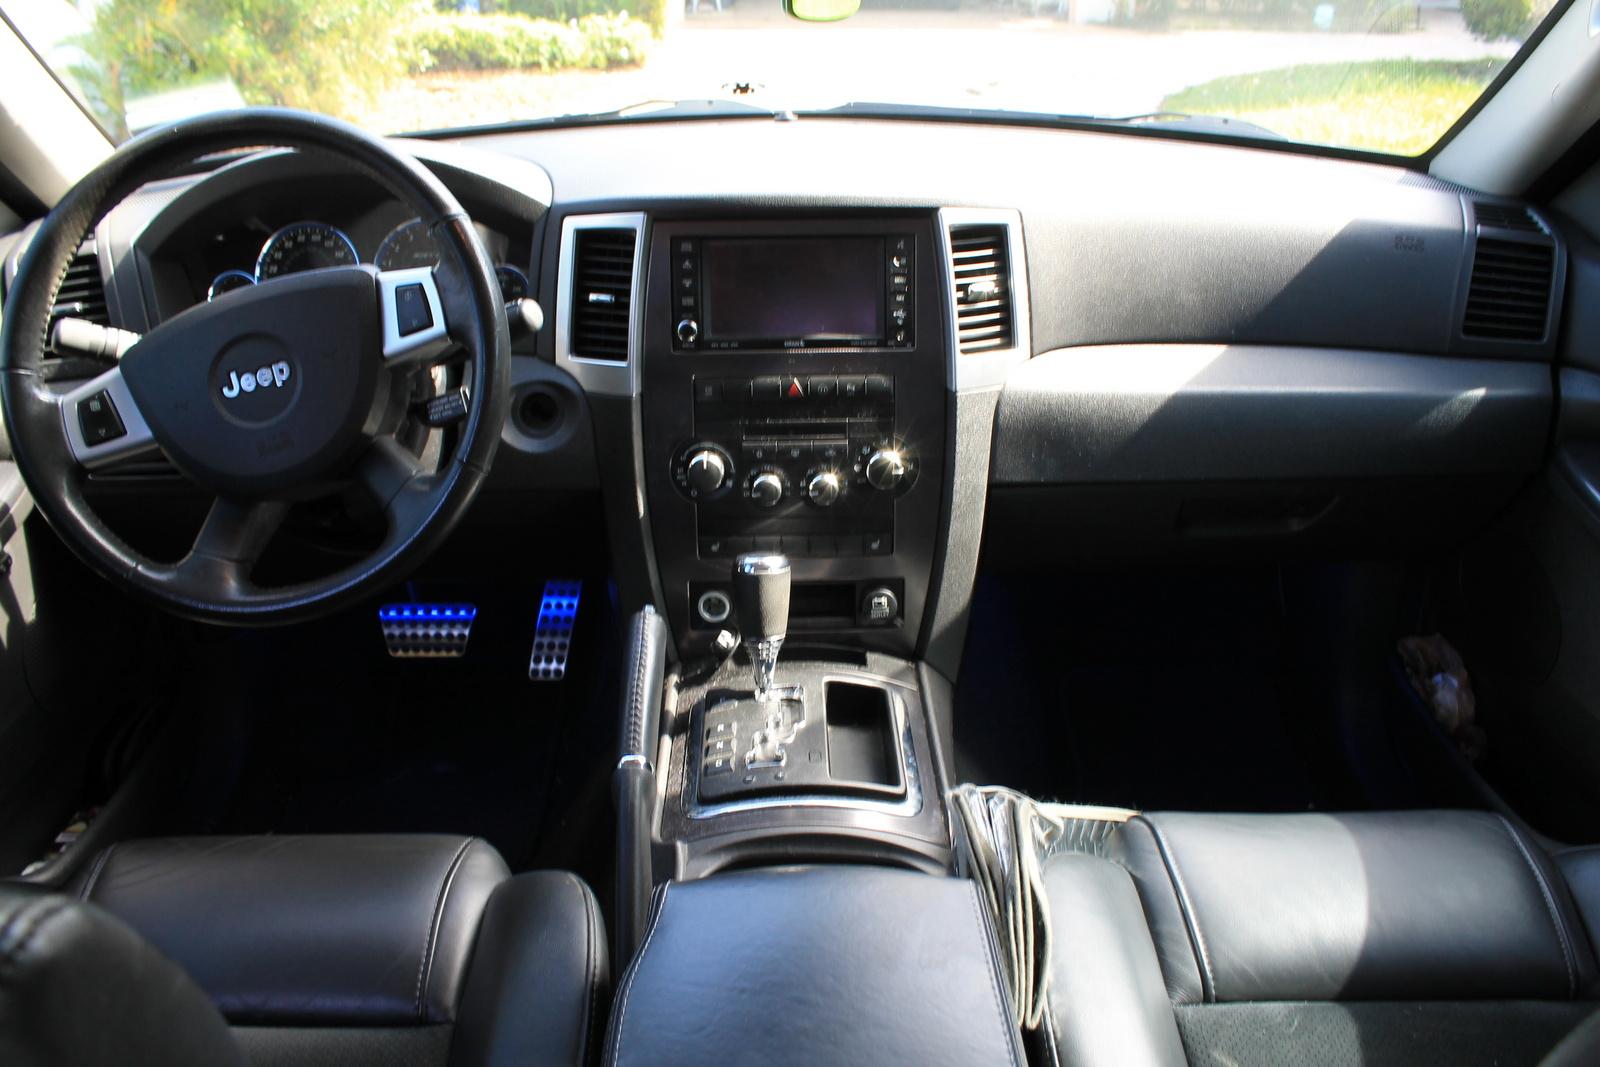 jeep cherokee grand 2008 srt8 interior cargurus cars